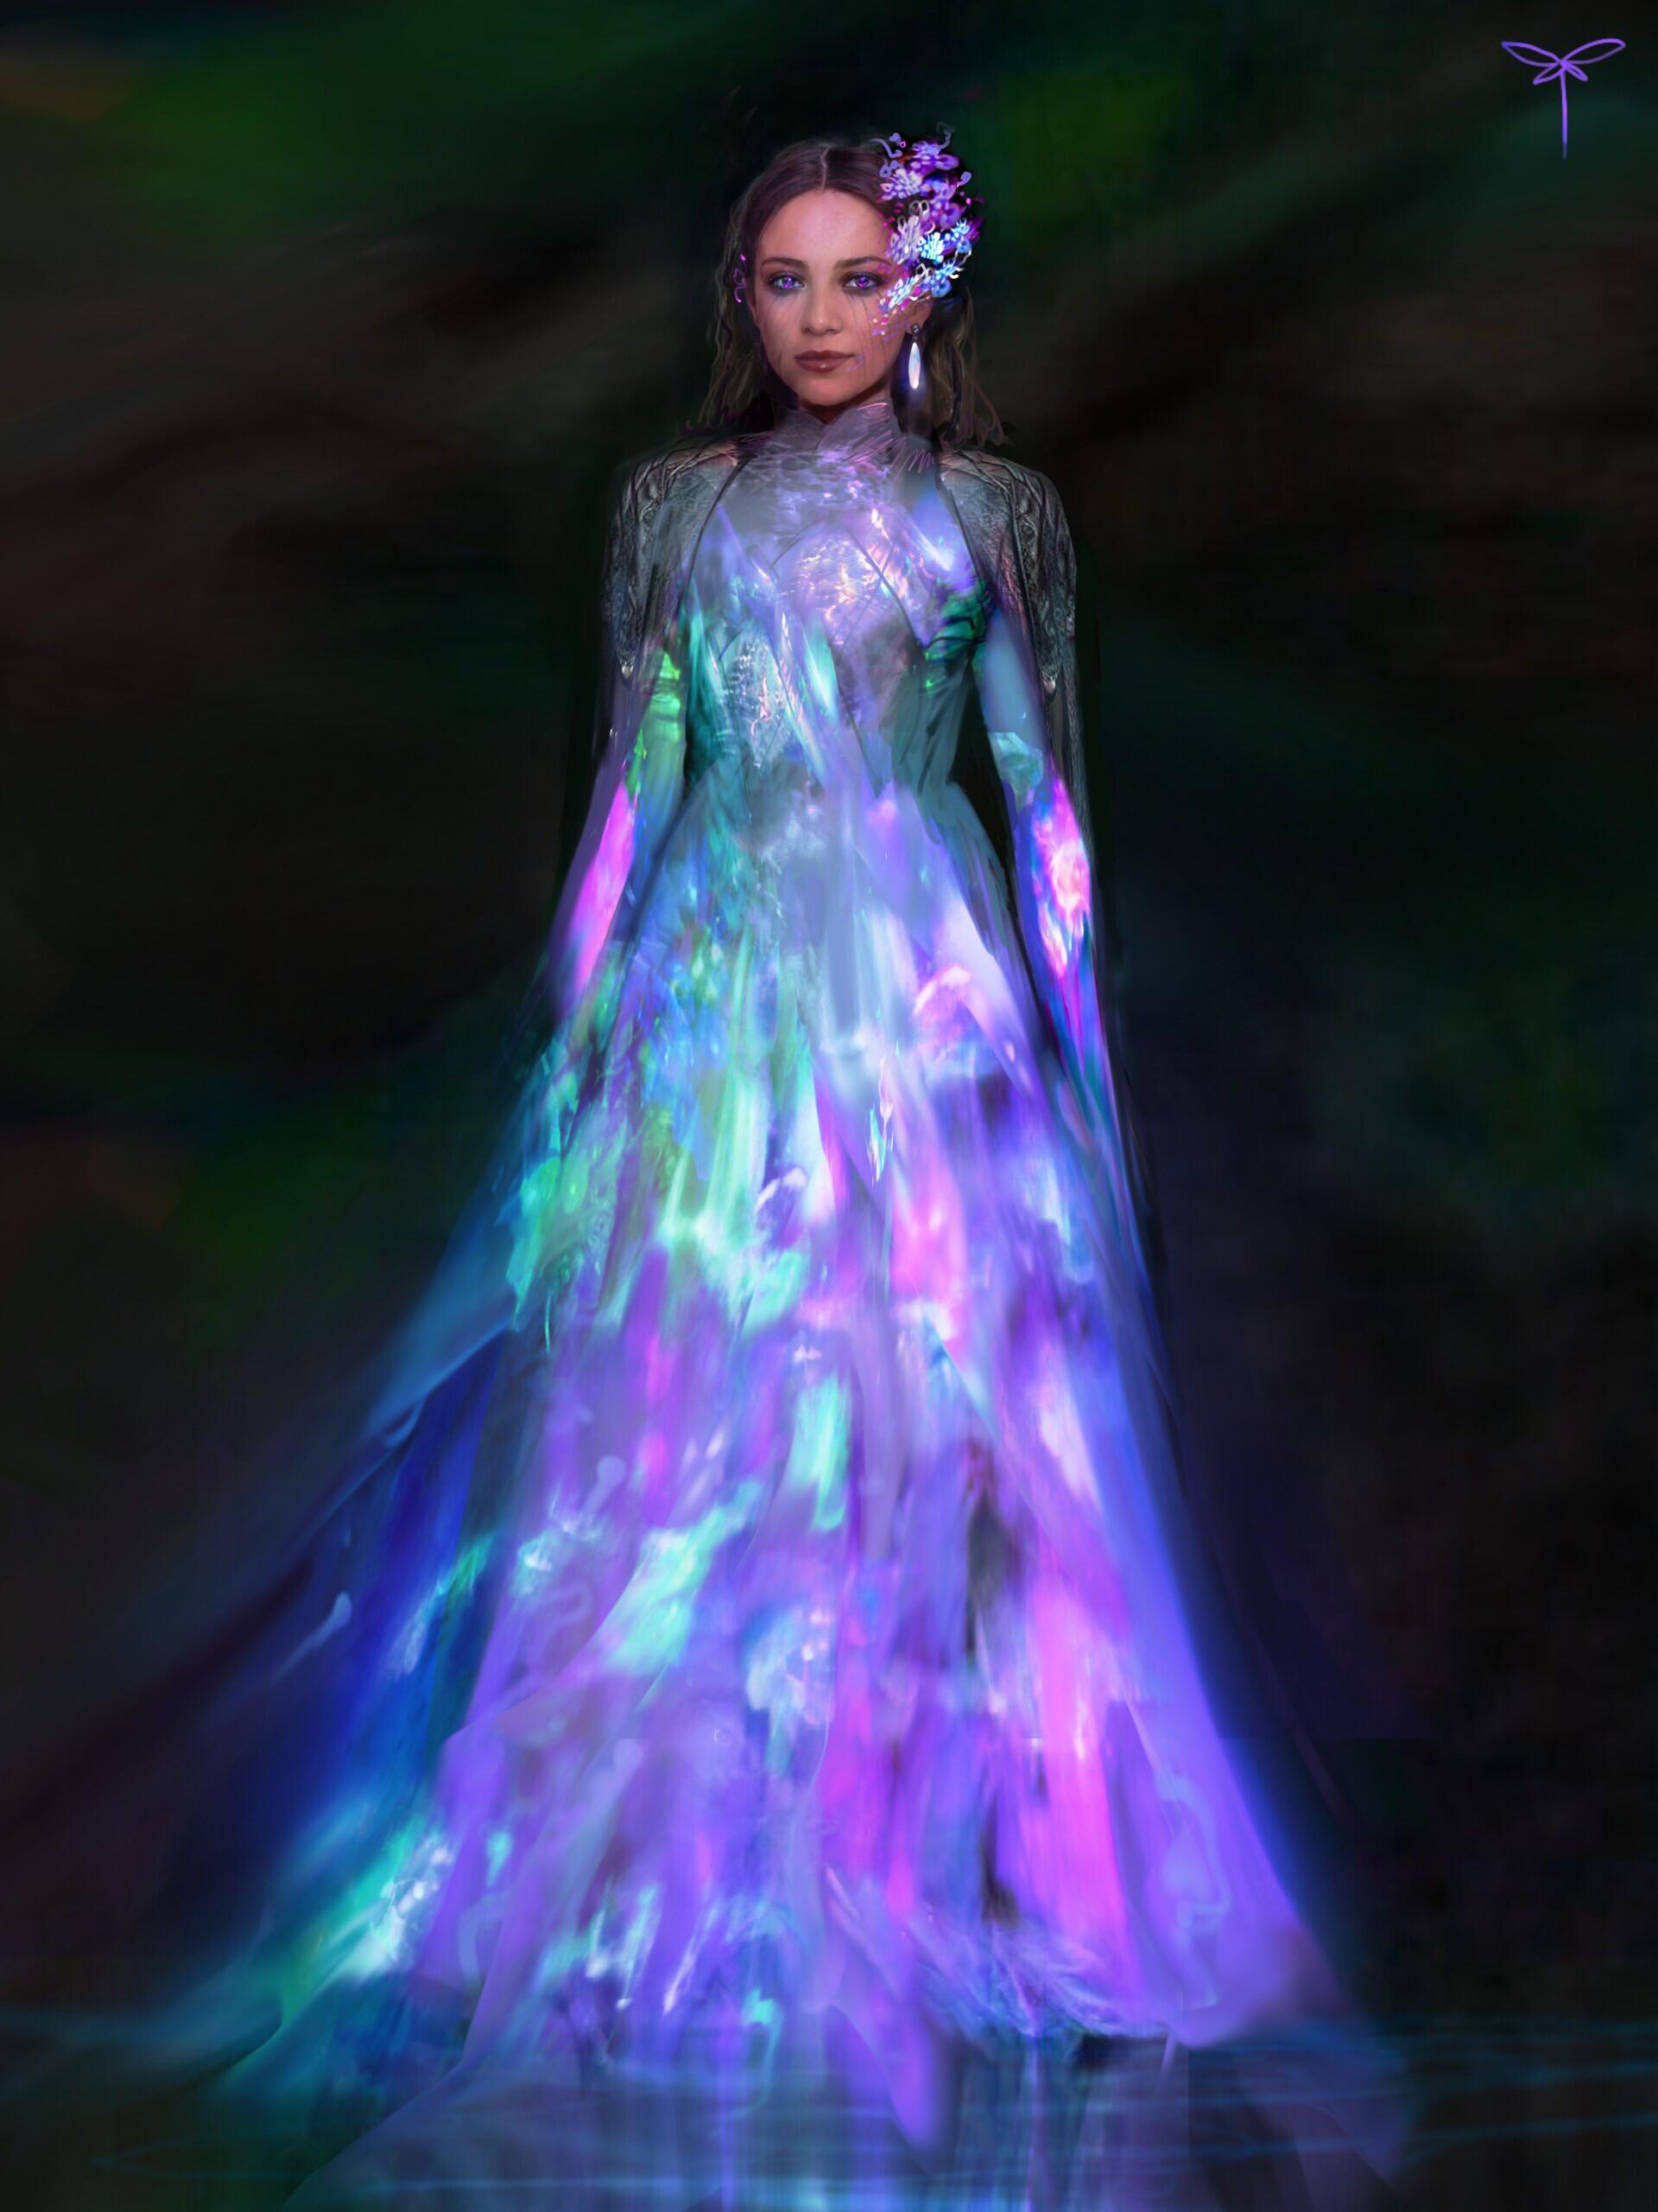 Holo dress costume design